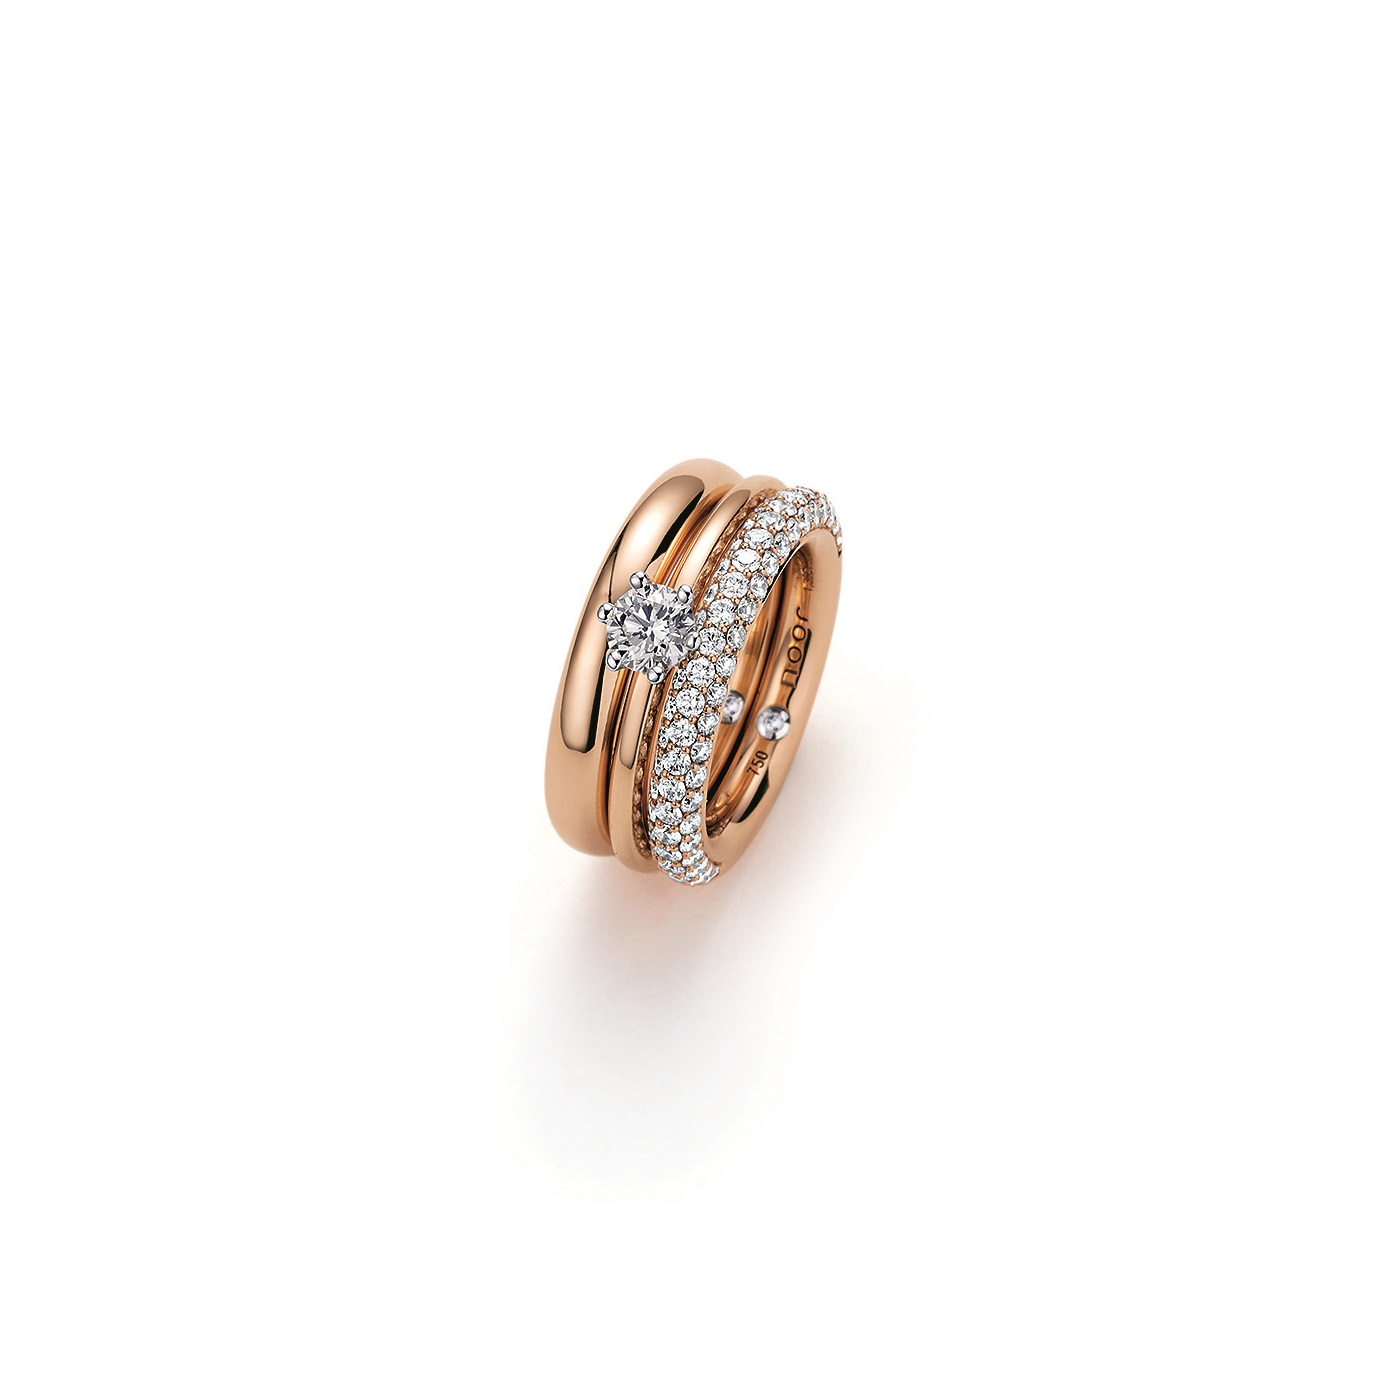 Ring aus Roségold mit Diamanten